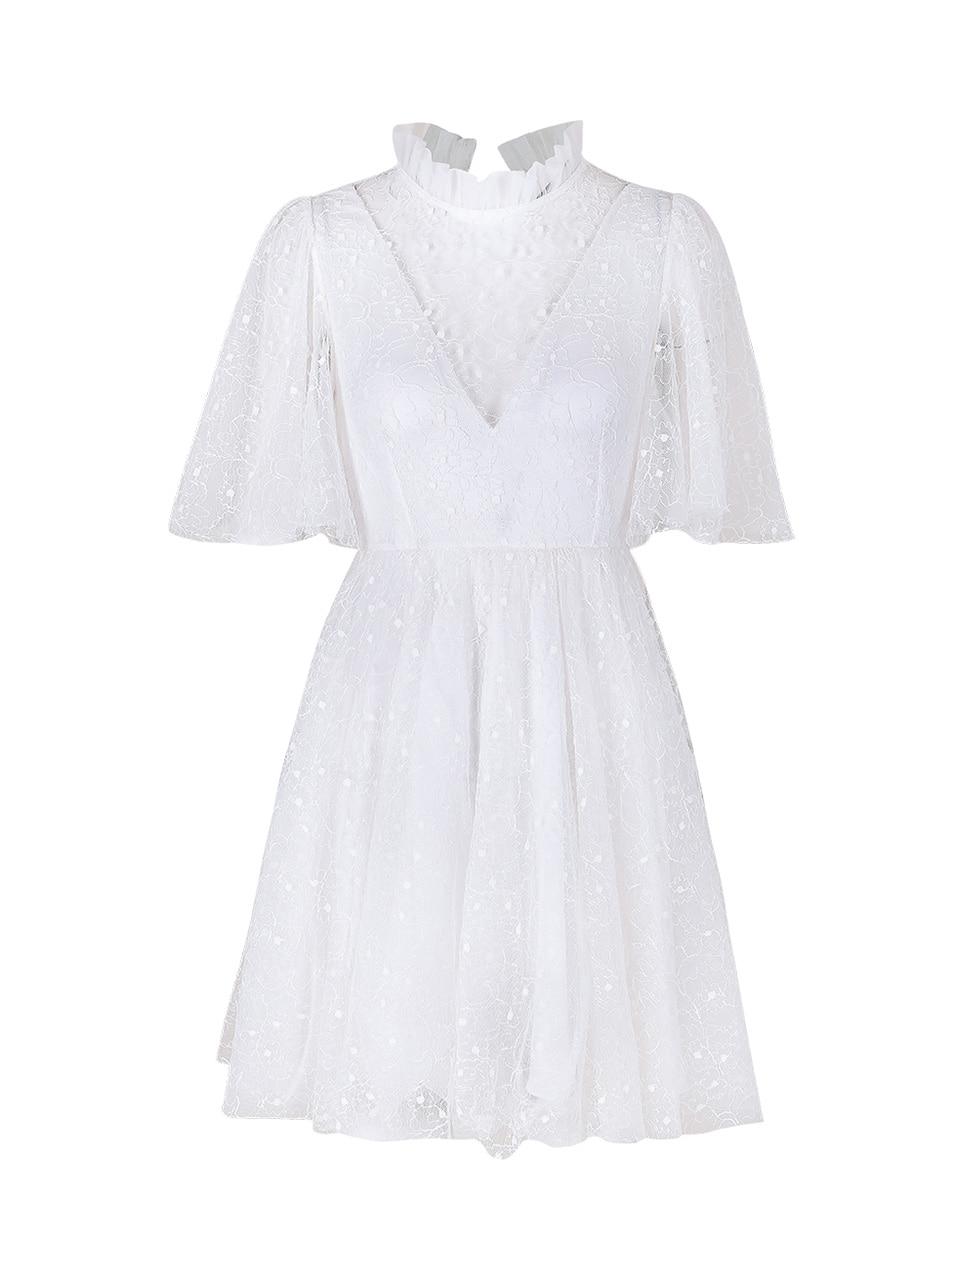 GUKAWinni see-through Short Dress